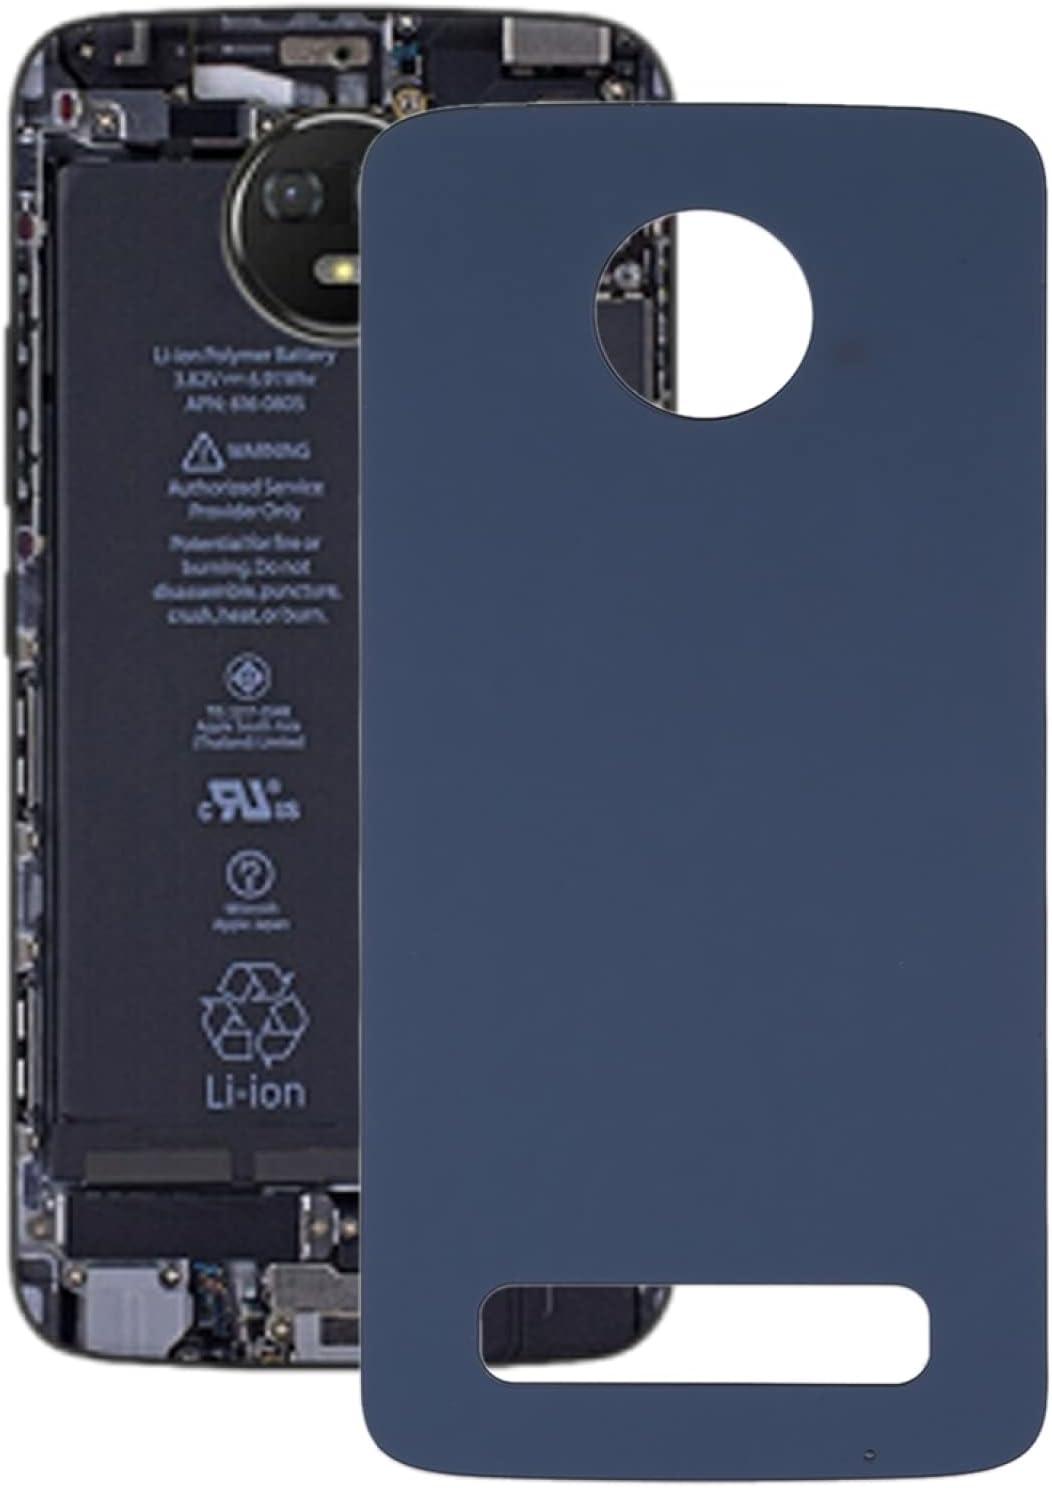 Smart Phone Back Cover Battery In stock P Z3 Moto for Max 90% OFF Motorola